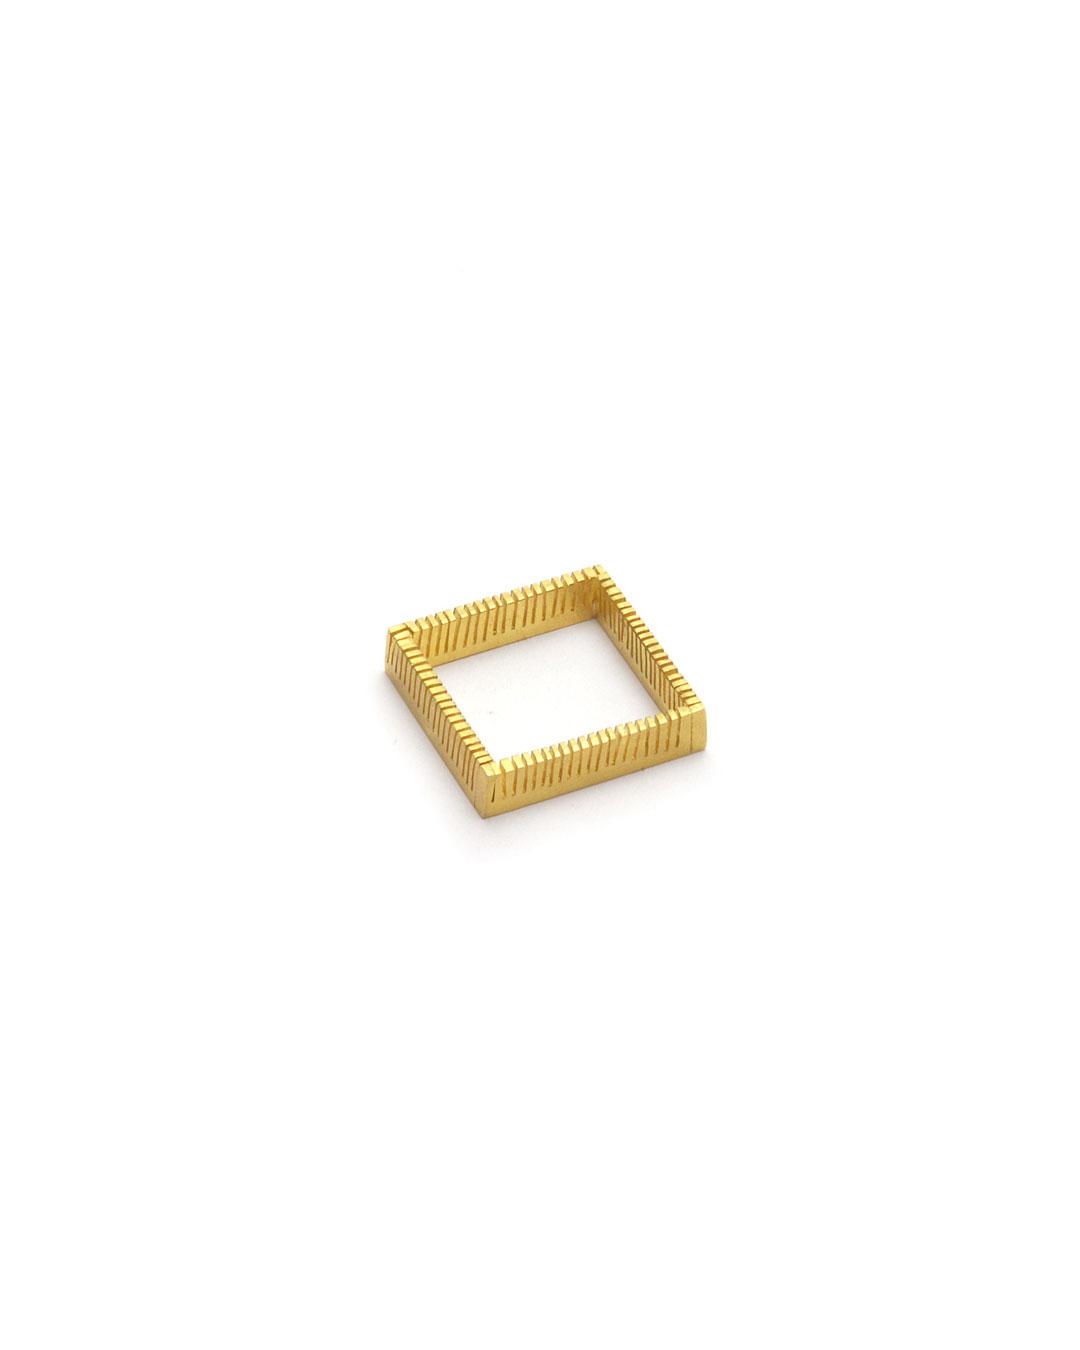 Stefano Marchetti, untitled, 2014, ring; gold, 22 x 22 x 4 mm, €3000